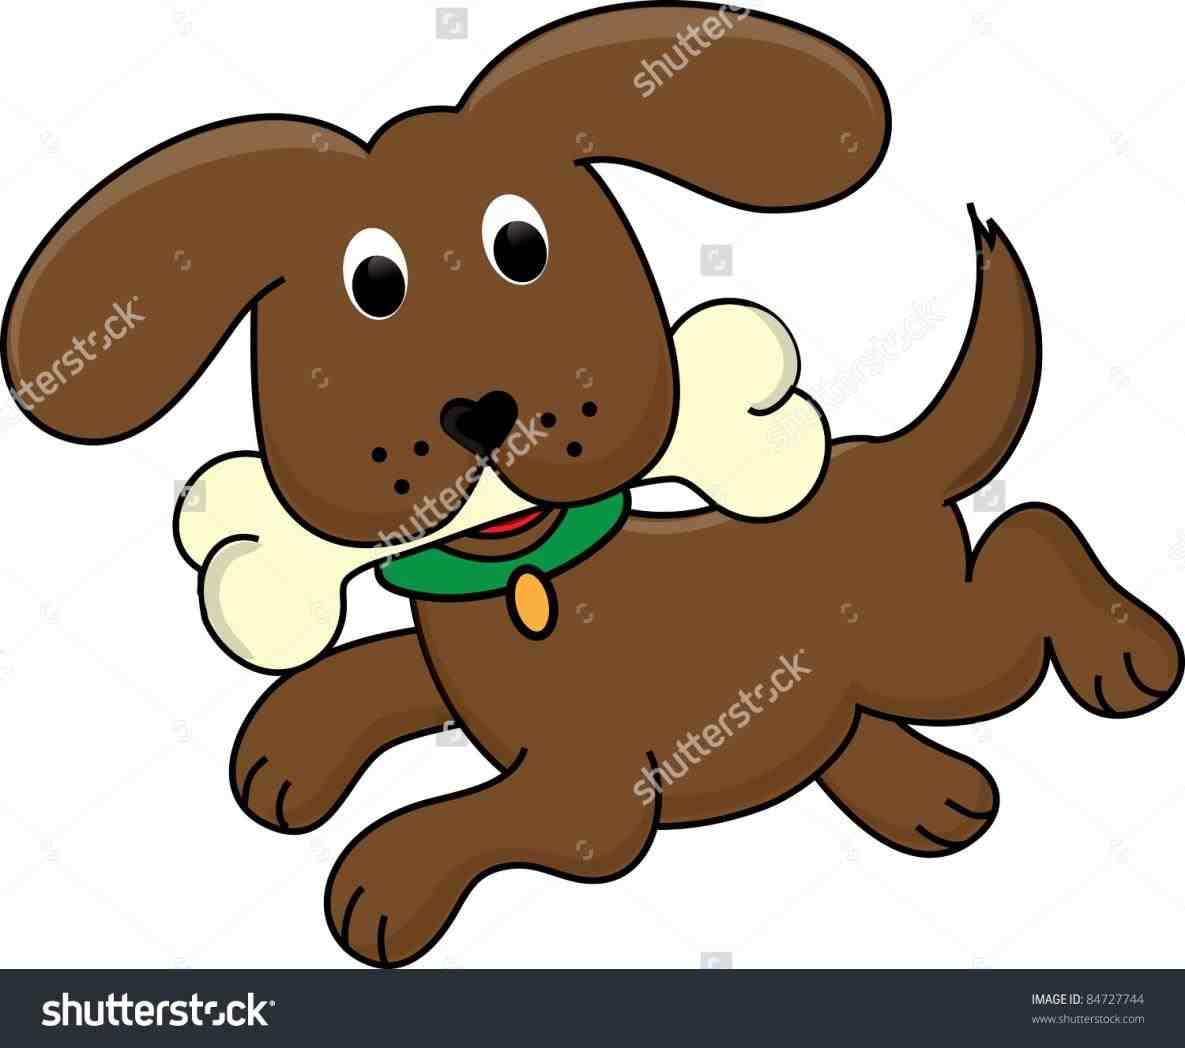 1185x1048 Christmas Dog Bone Clipart Cheminee.website